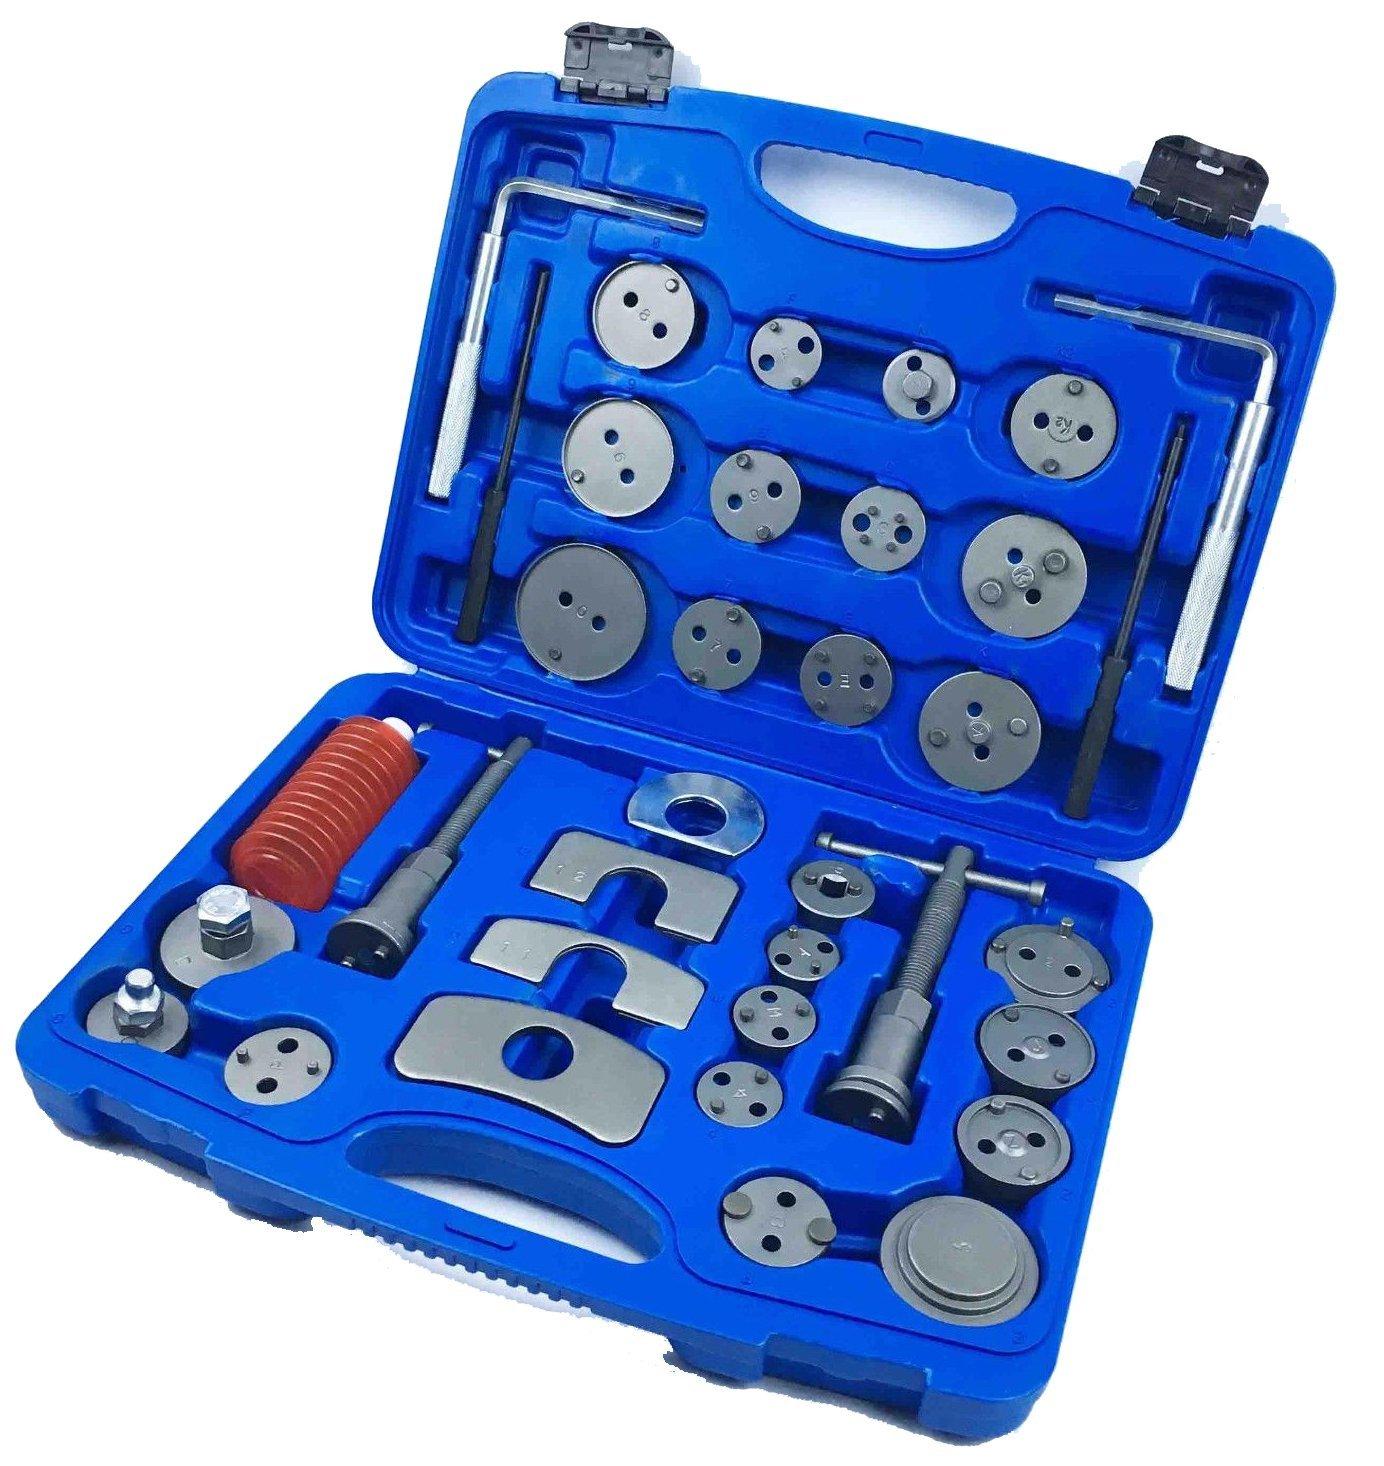 Brake Disc Caliper Wind Back Tool Kit - 35 Piece Universal Piston Rewind Set - Discs Break Pad Caliper Compressor Service Tools - by Jecr (Image #7)